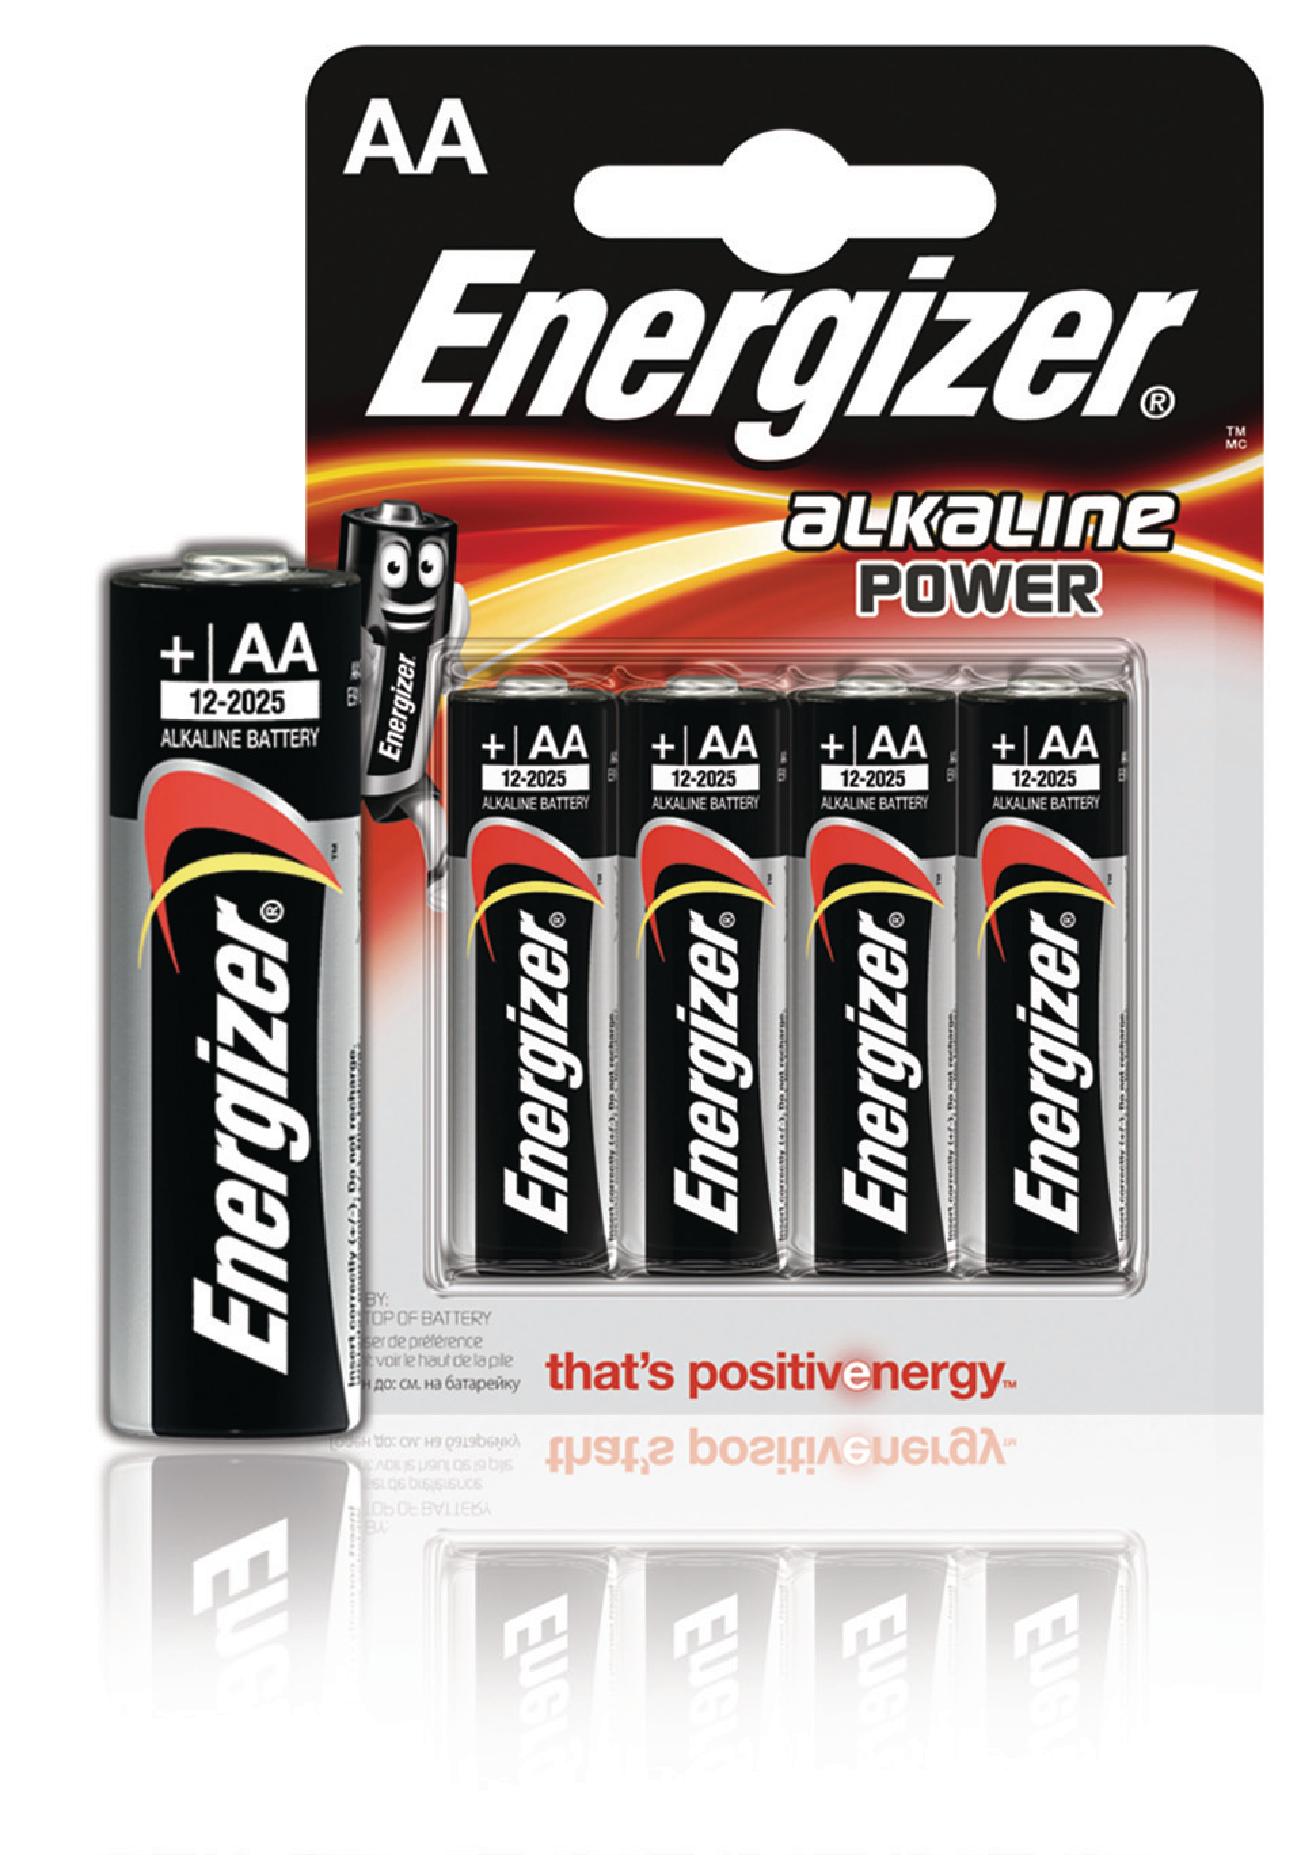 Alkalická baterie Energizer Power AA 1.5V, 4ks, EN-E300132900